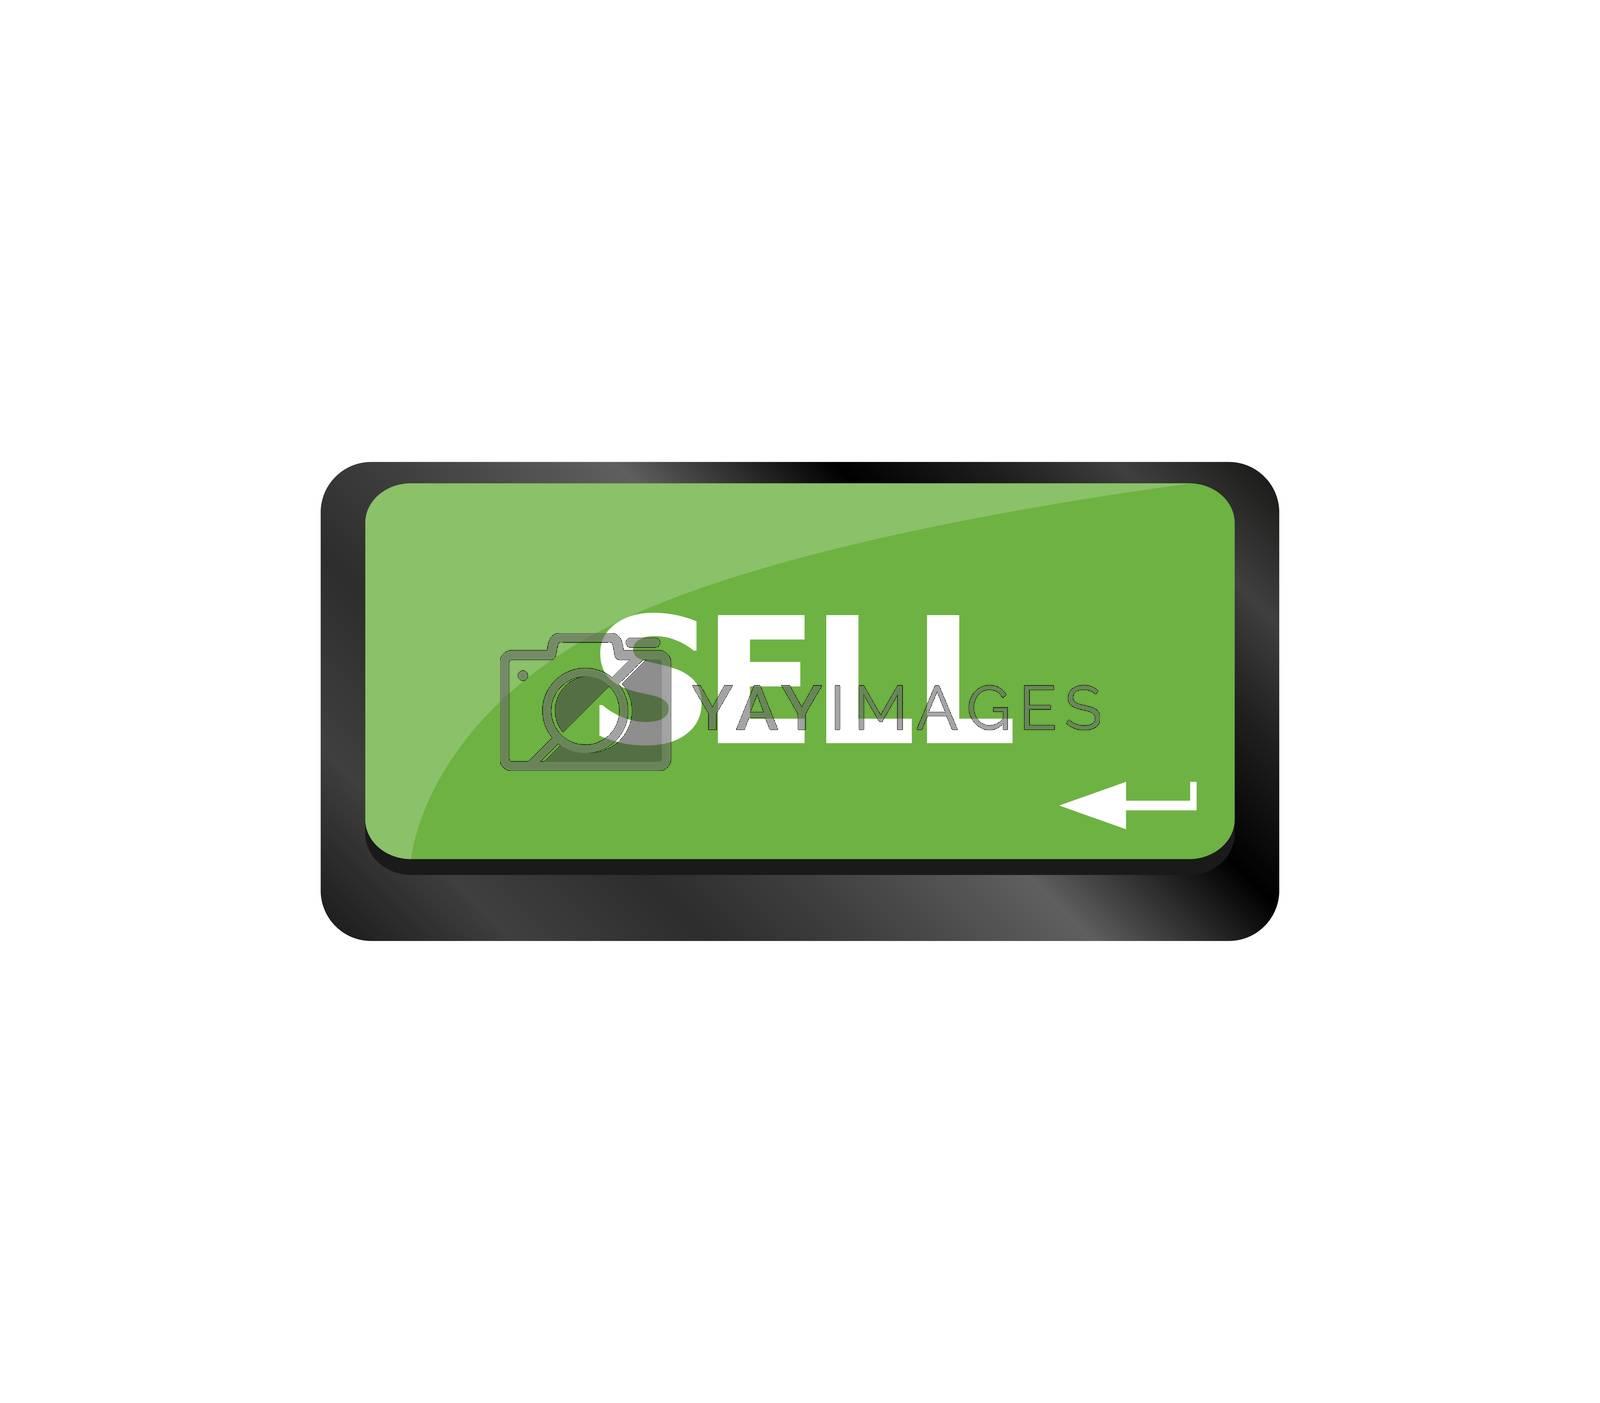 sell written on keyboard keys showing business or finance concept